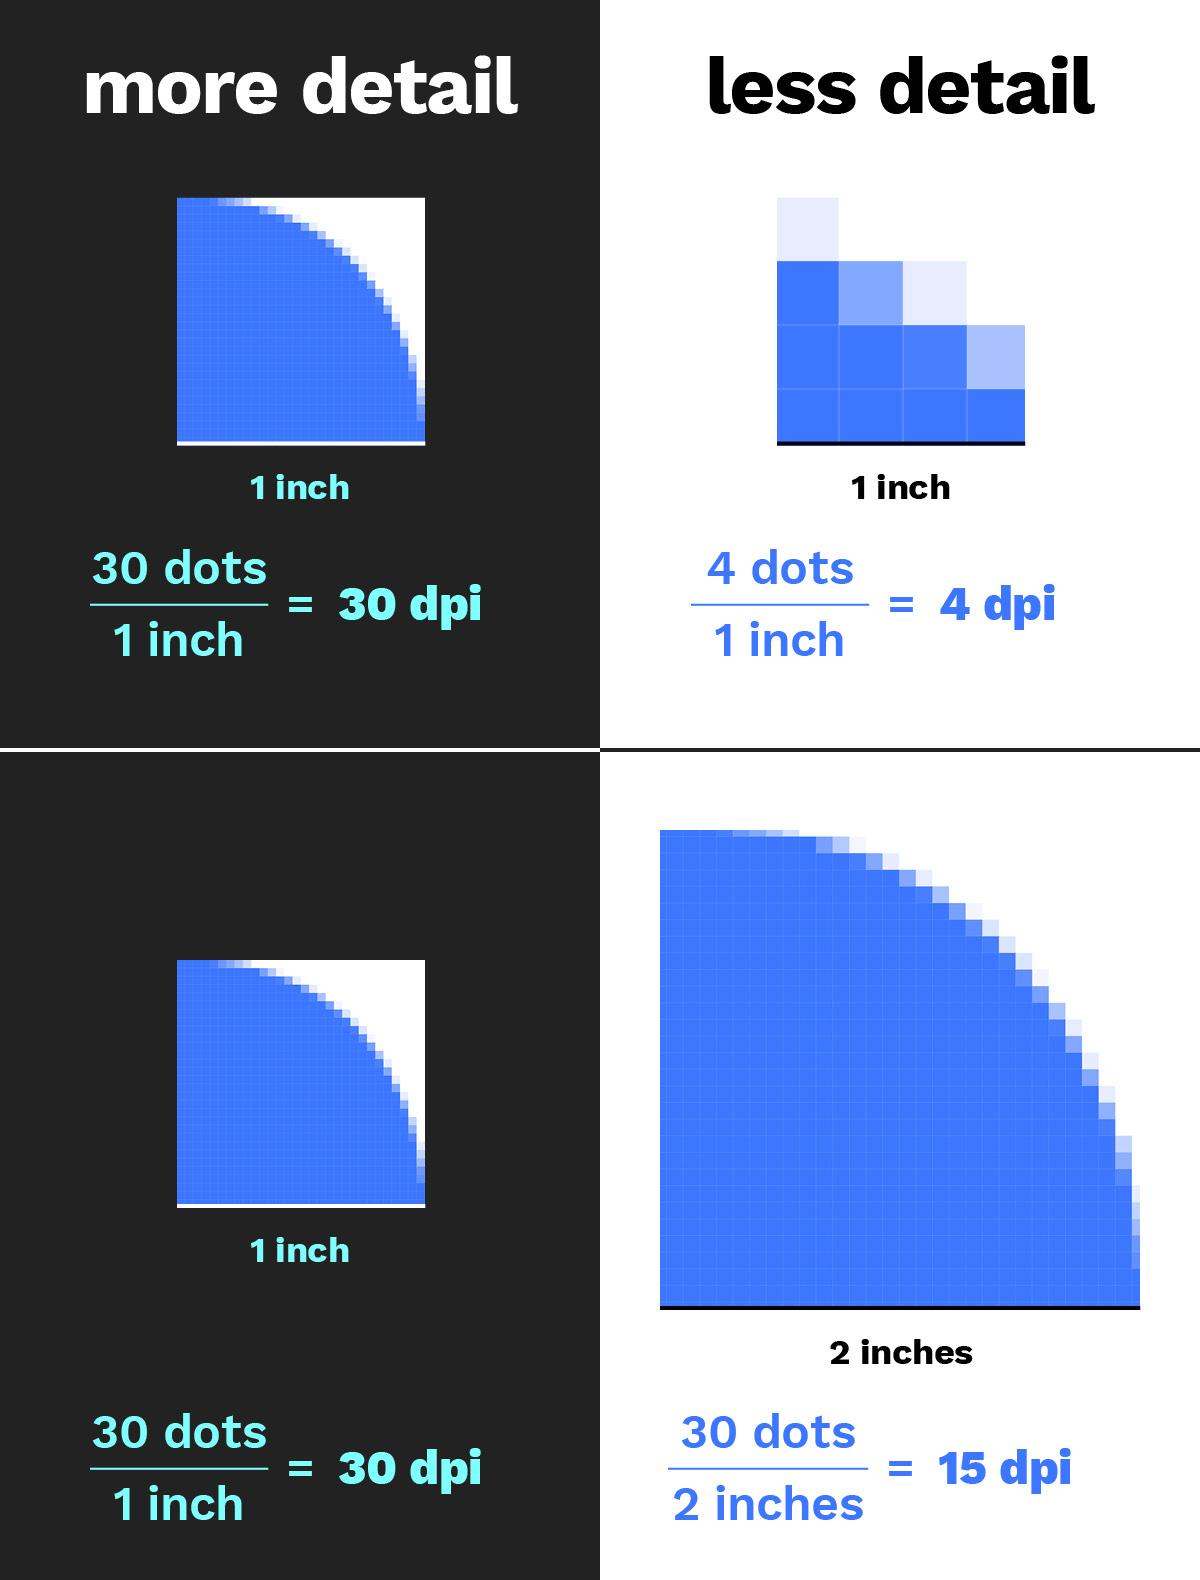 More detail vs. less detail